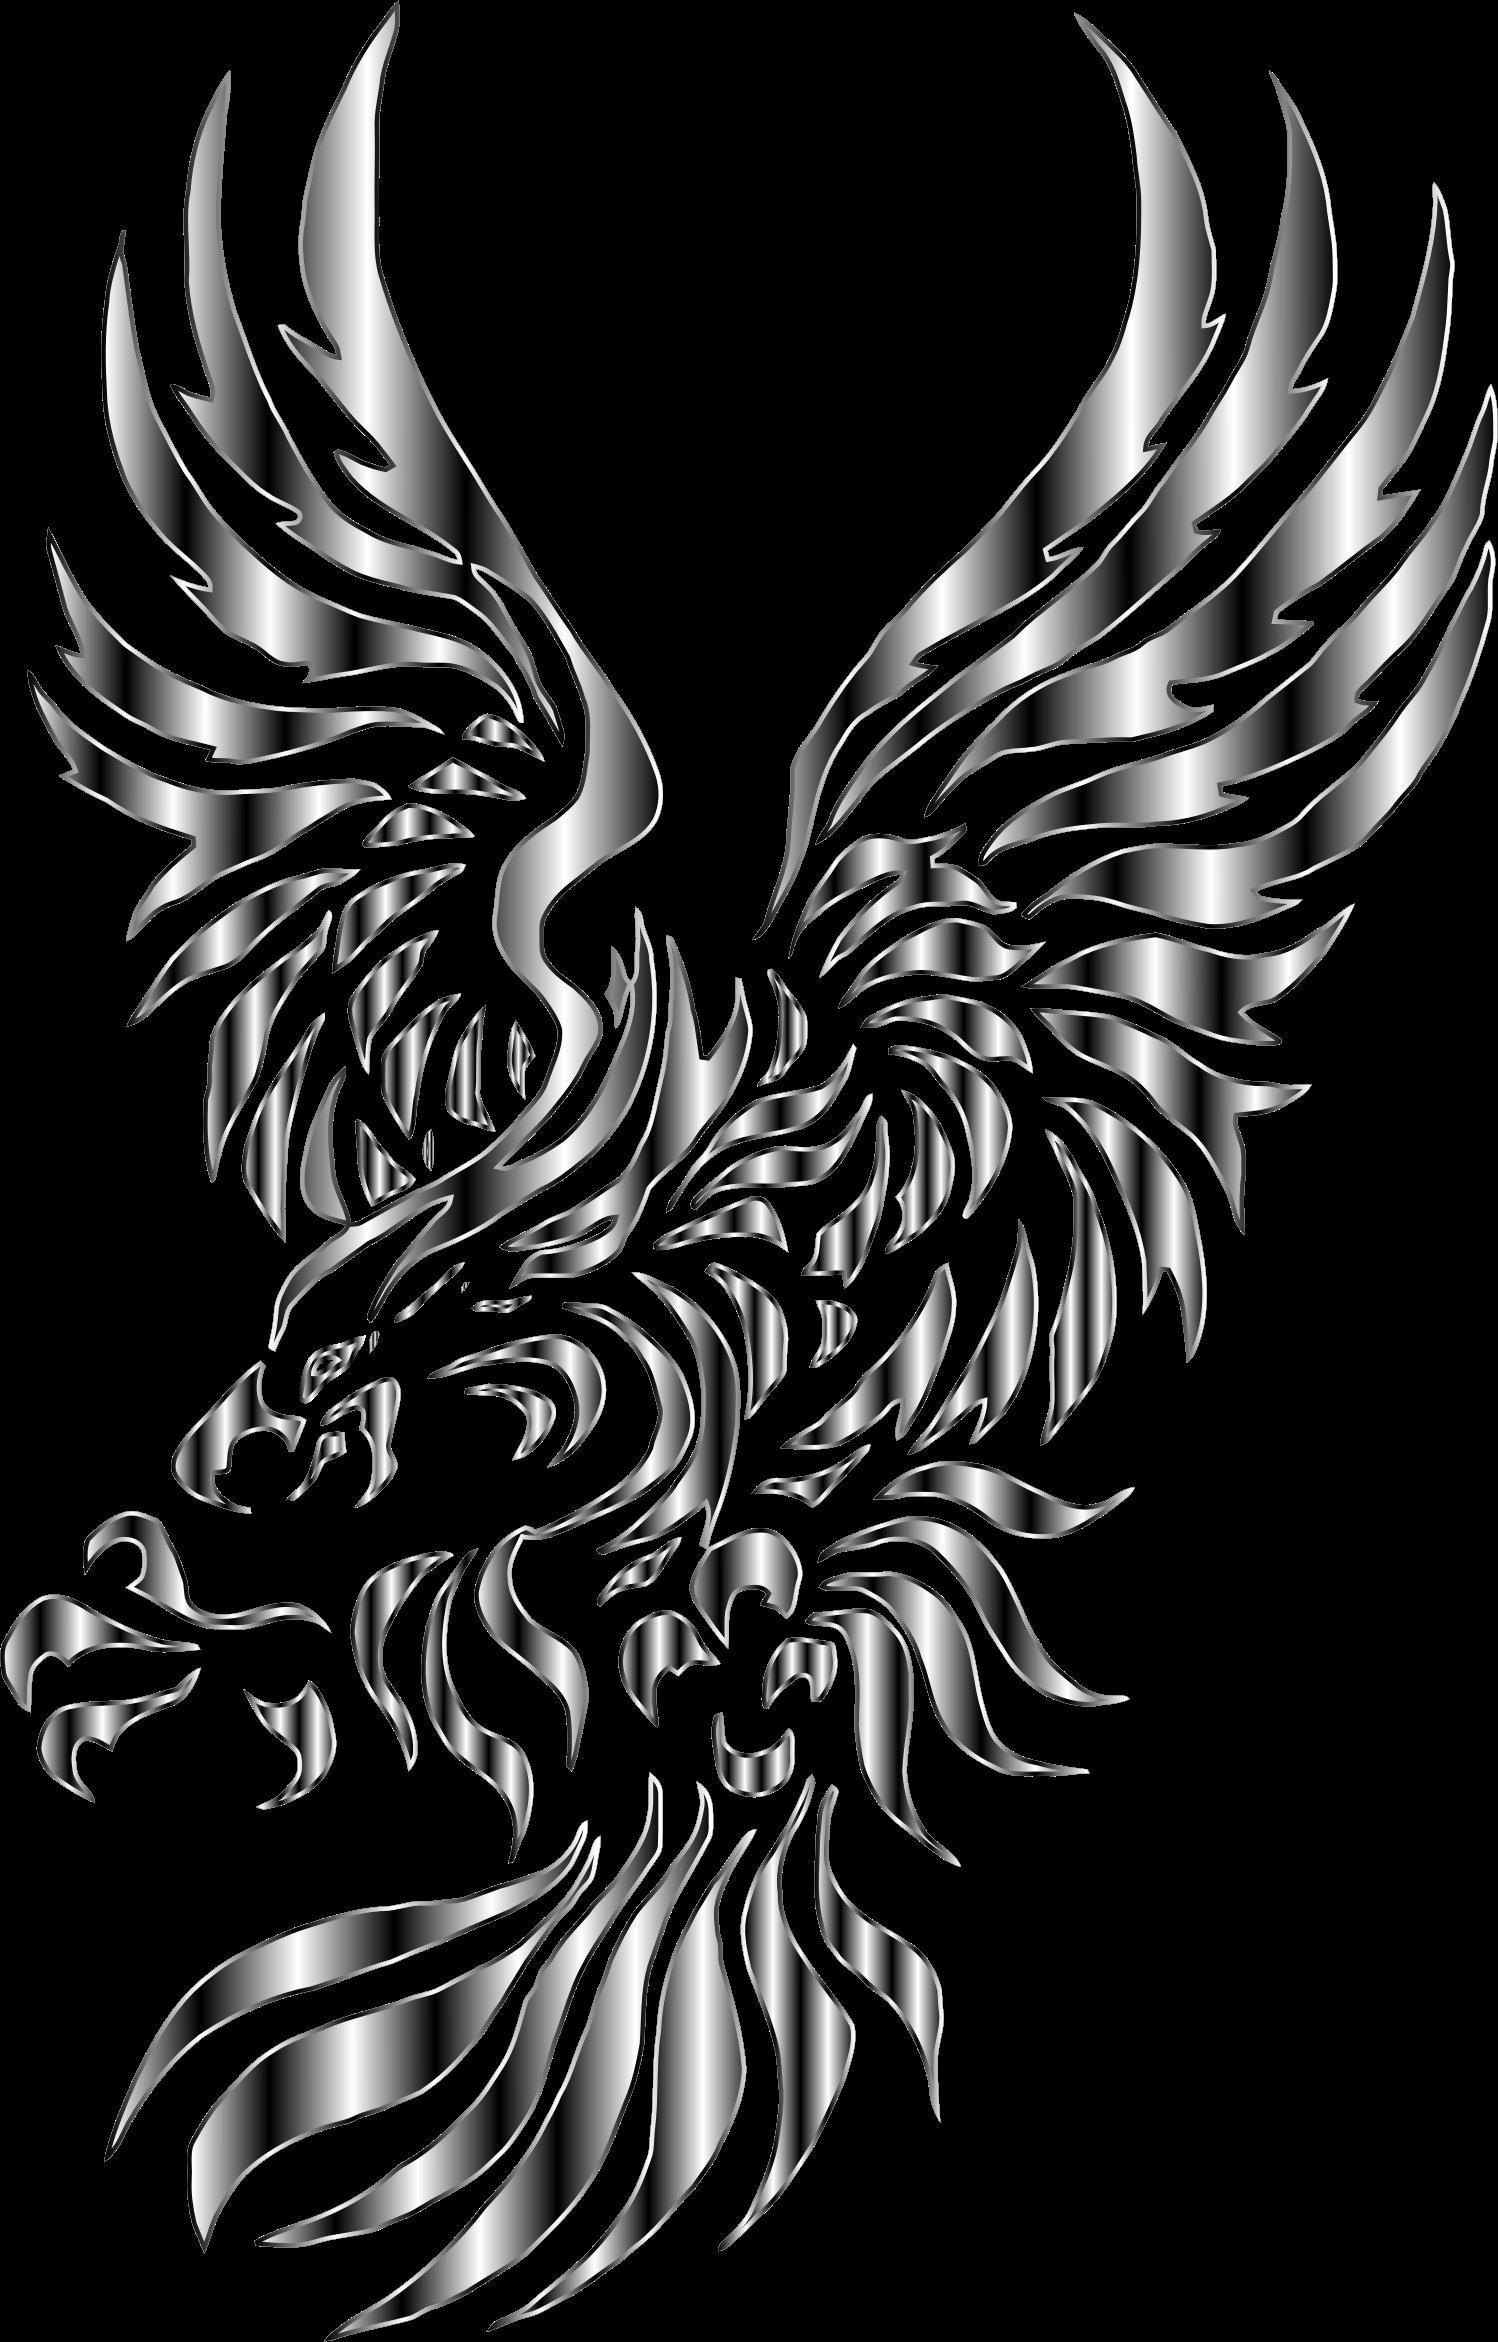 Chromatic No Background Big Image Png Ⓒ - Tribal Eagle